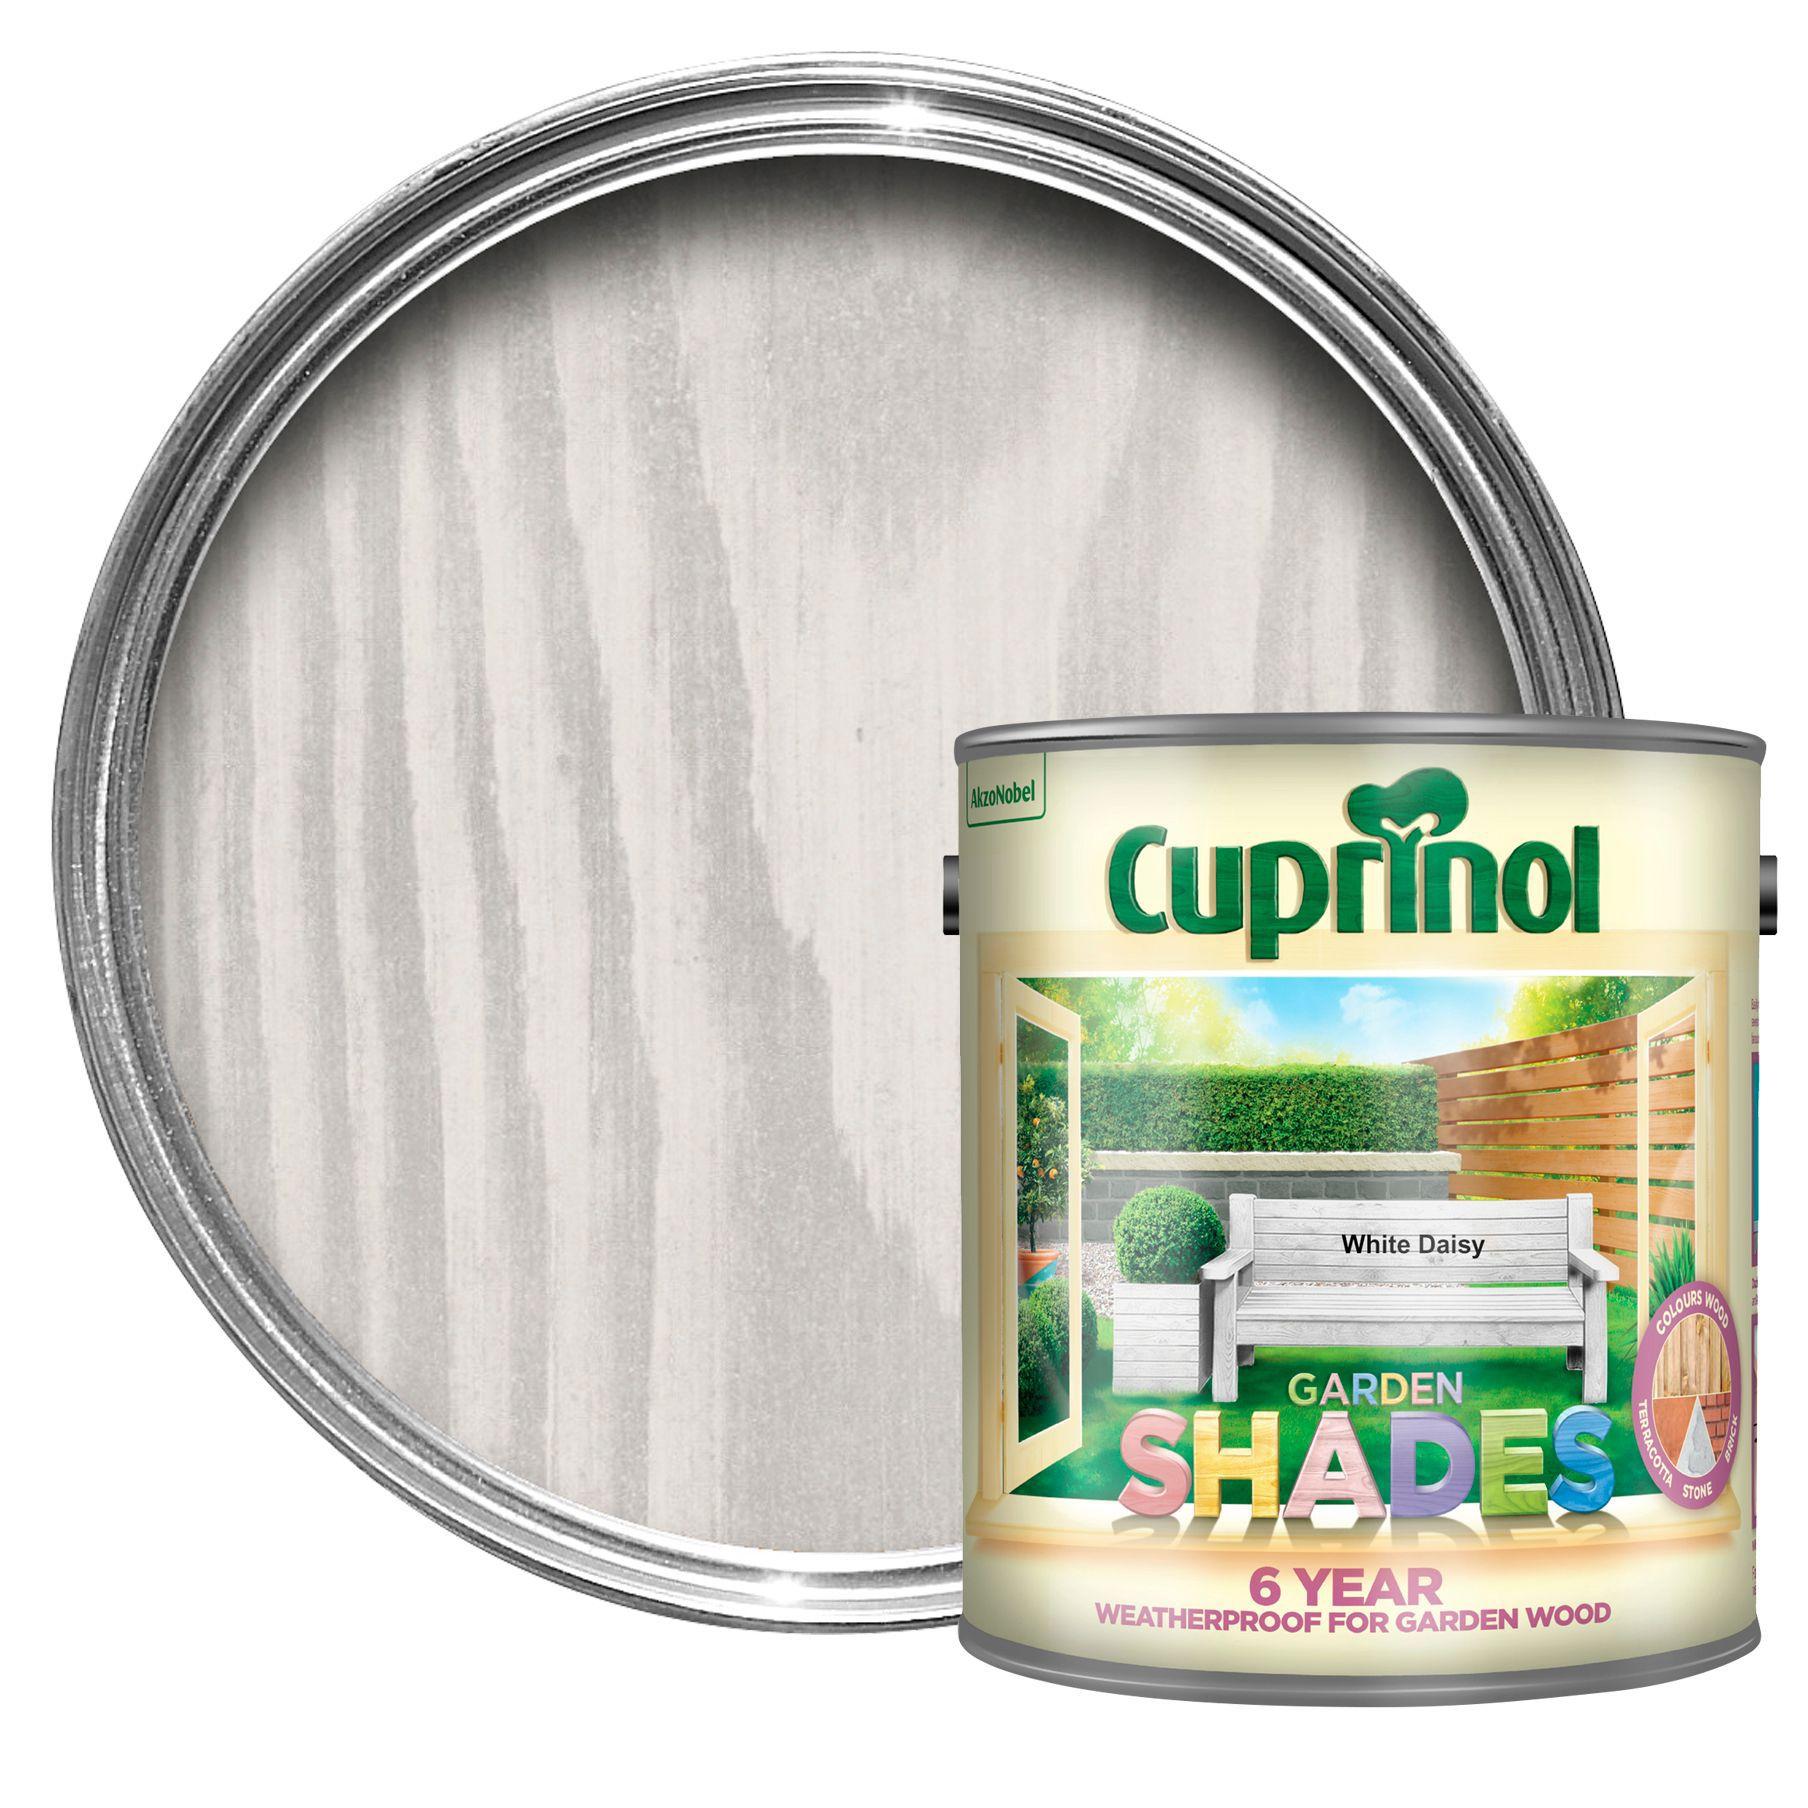 Cuprinol Garden Shades White Daisy Matt Wood Paint 2 5l Departments Diy At B Q